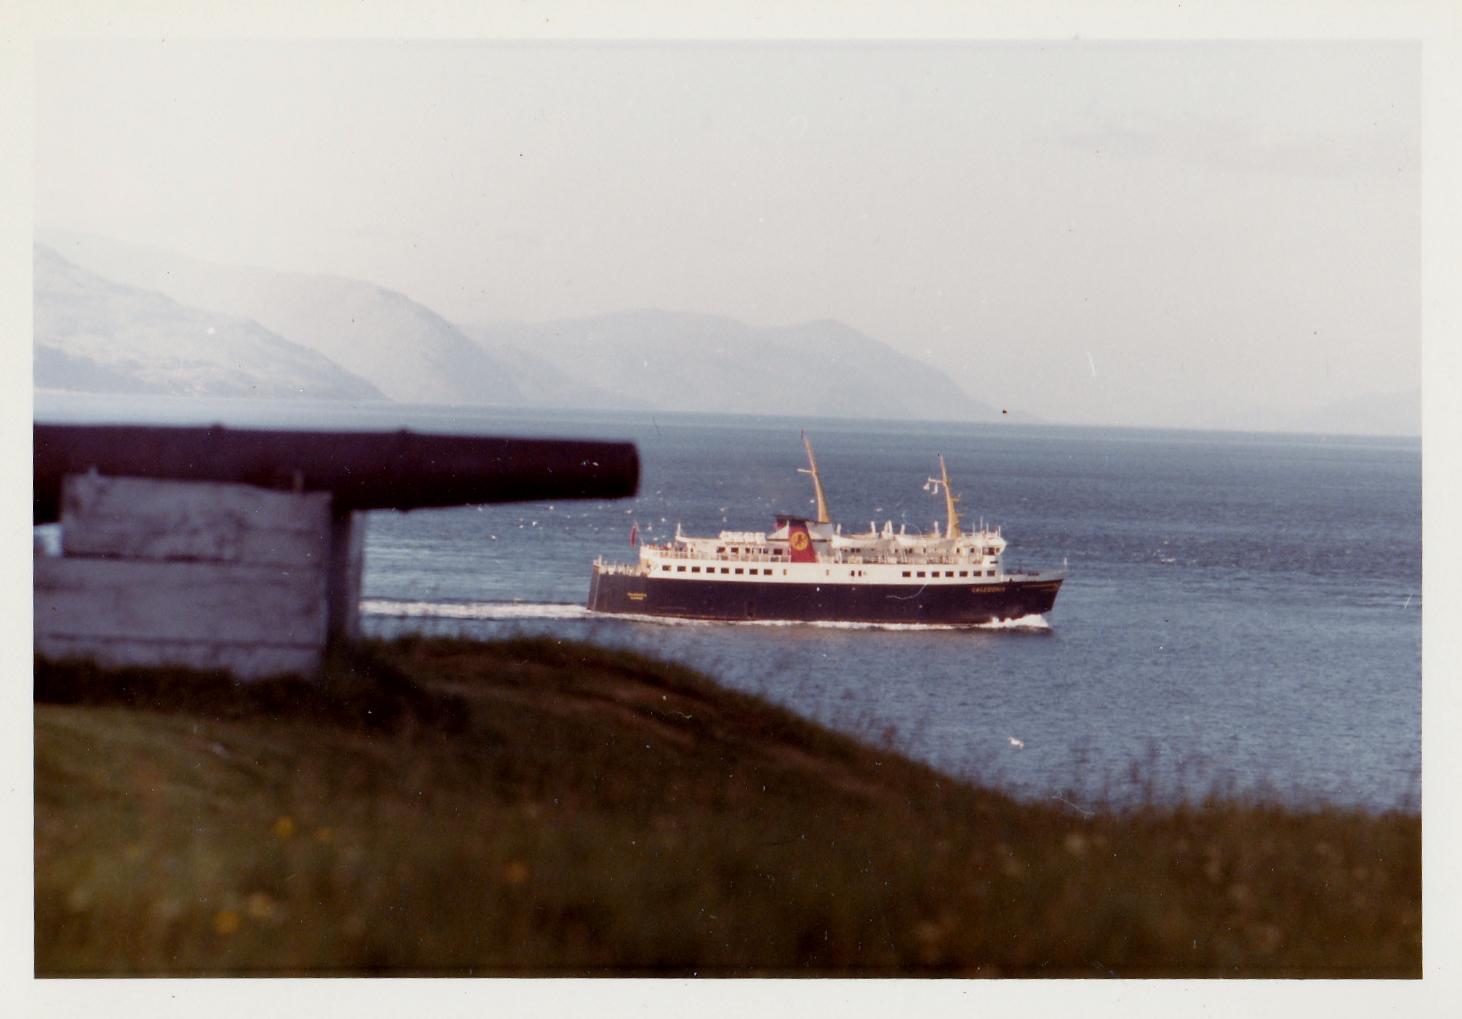 Caledonia passing Duart Castle (Jim Aikman Smith)